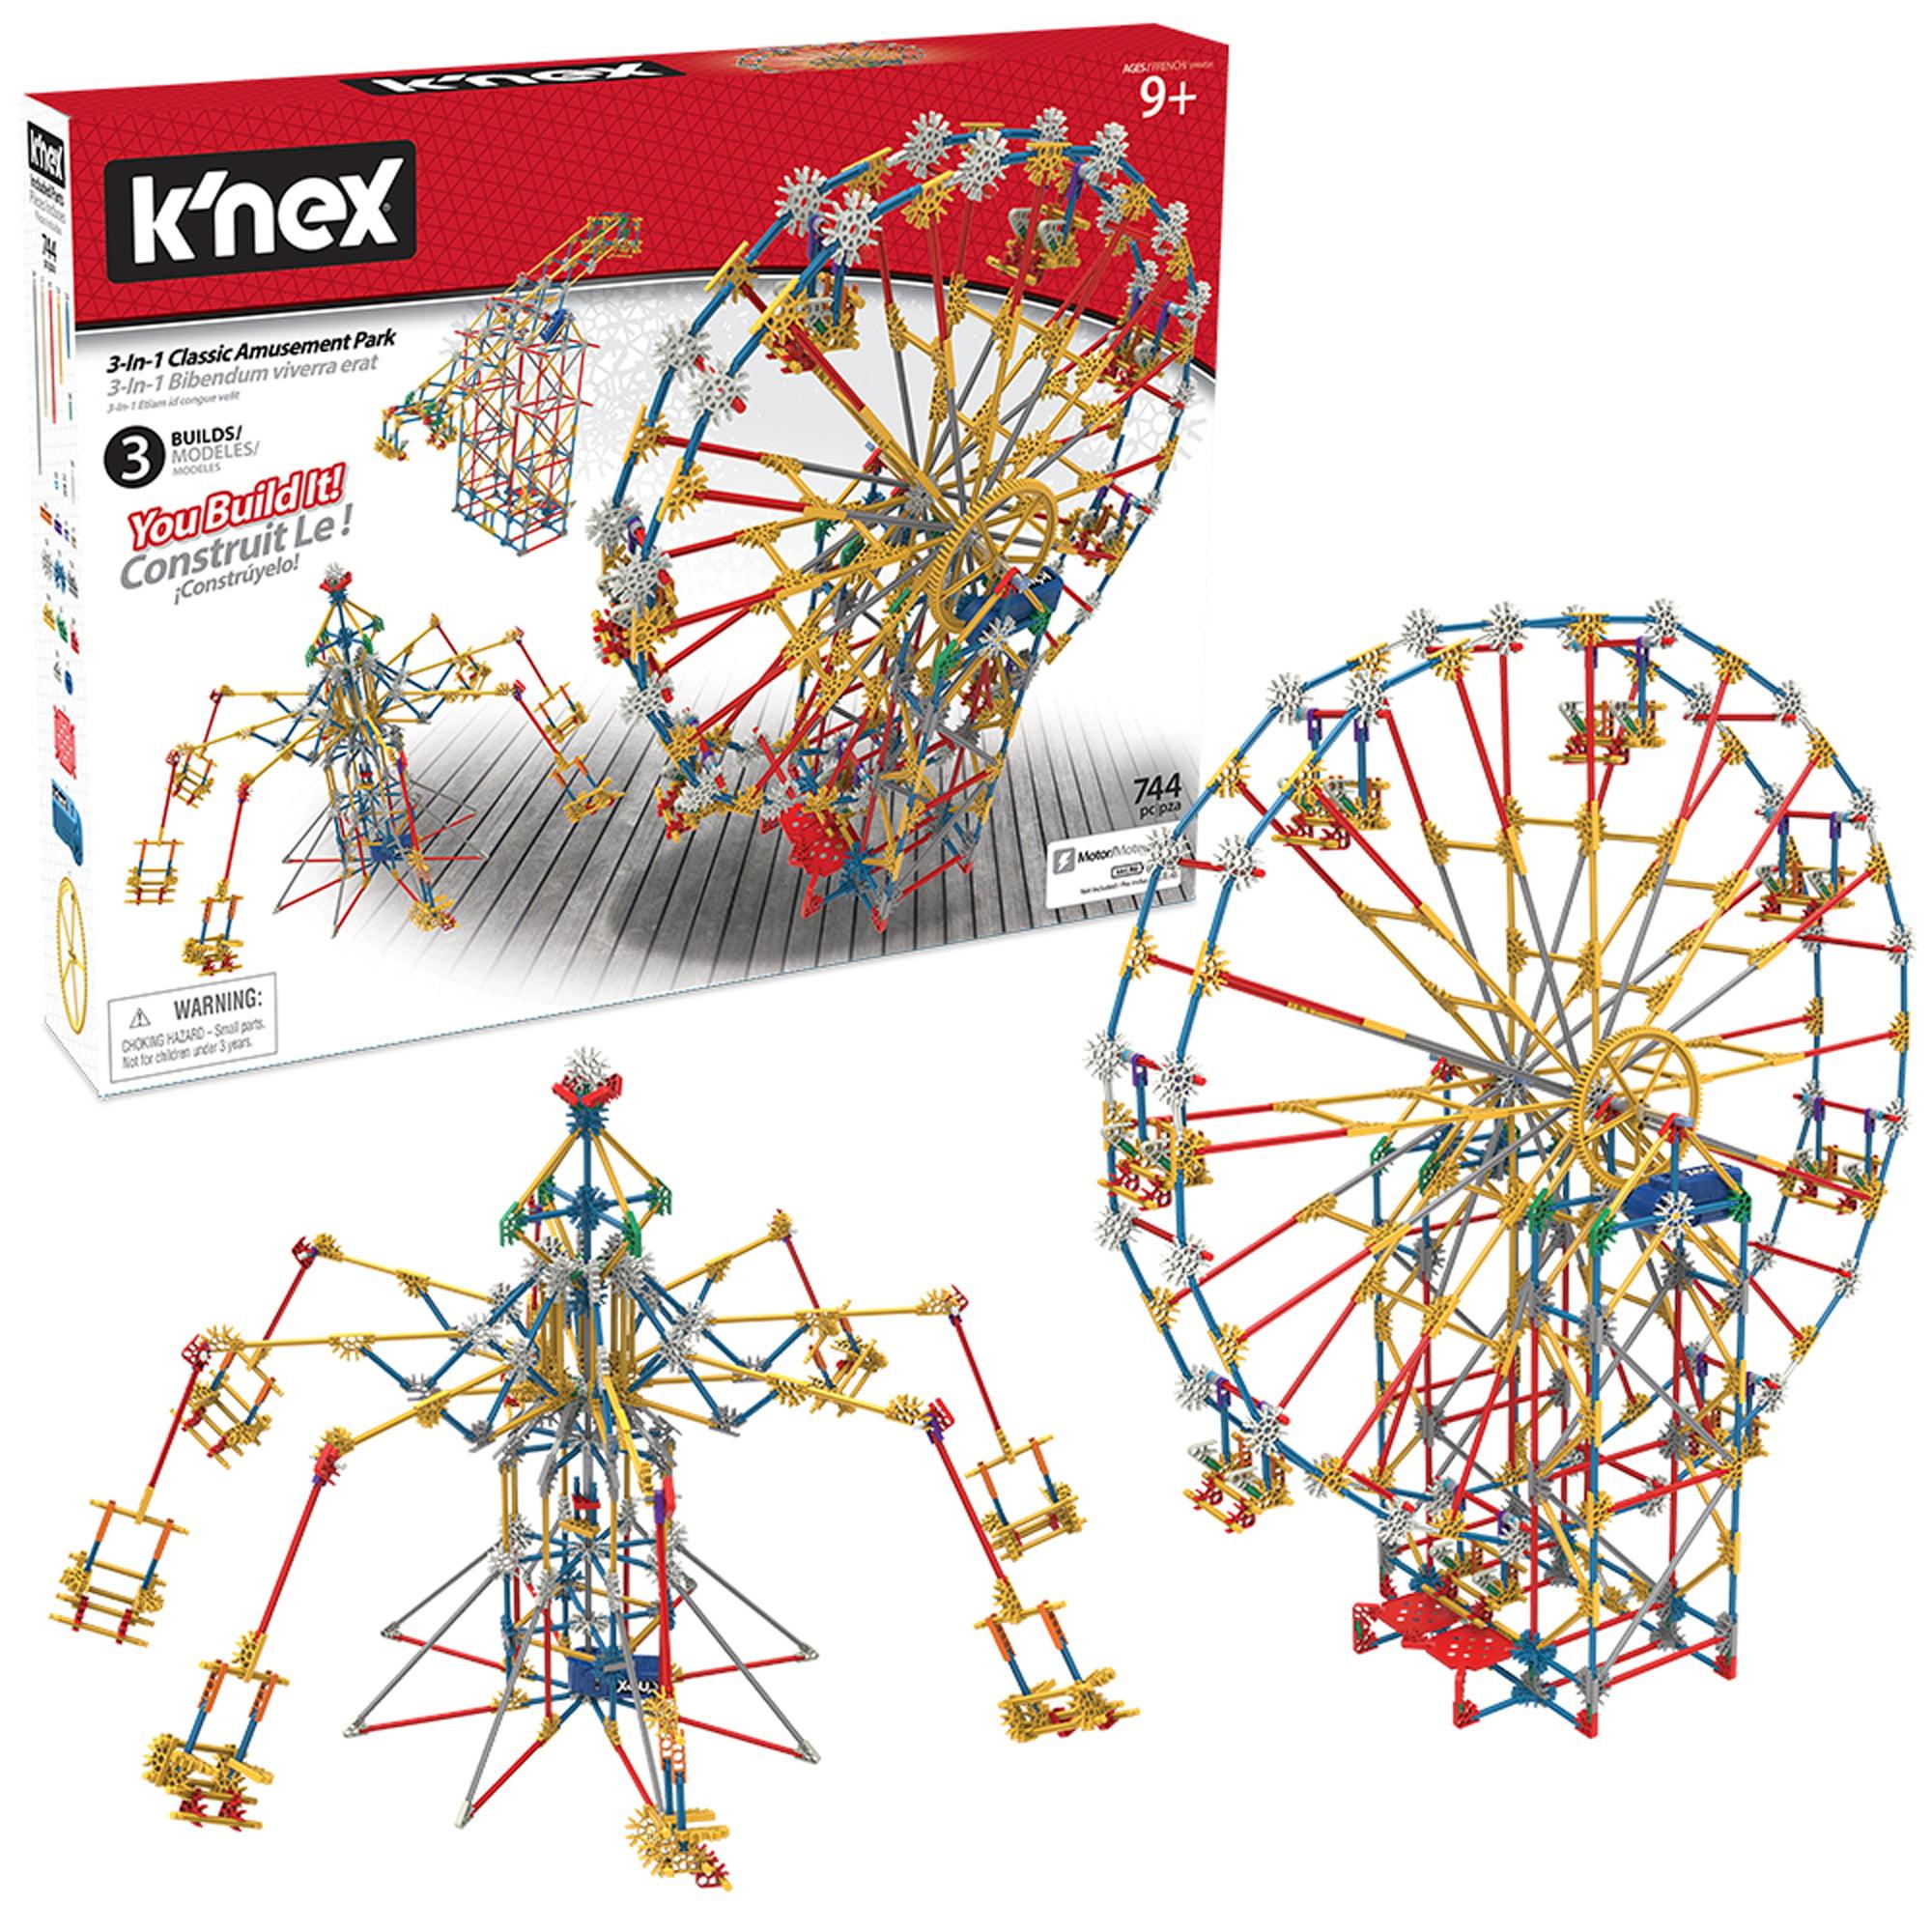 K Nex Thrill Rides 3 In 1 Classic Amusement Park Building Set 744 Pieces Ages 9 Engineering Education Toy Walmart Com Walmart Com